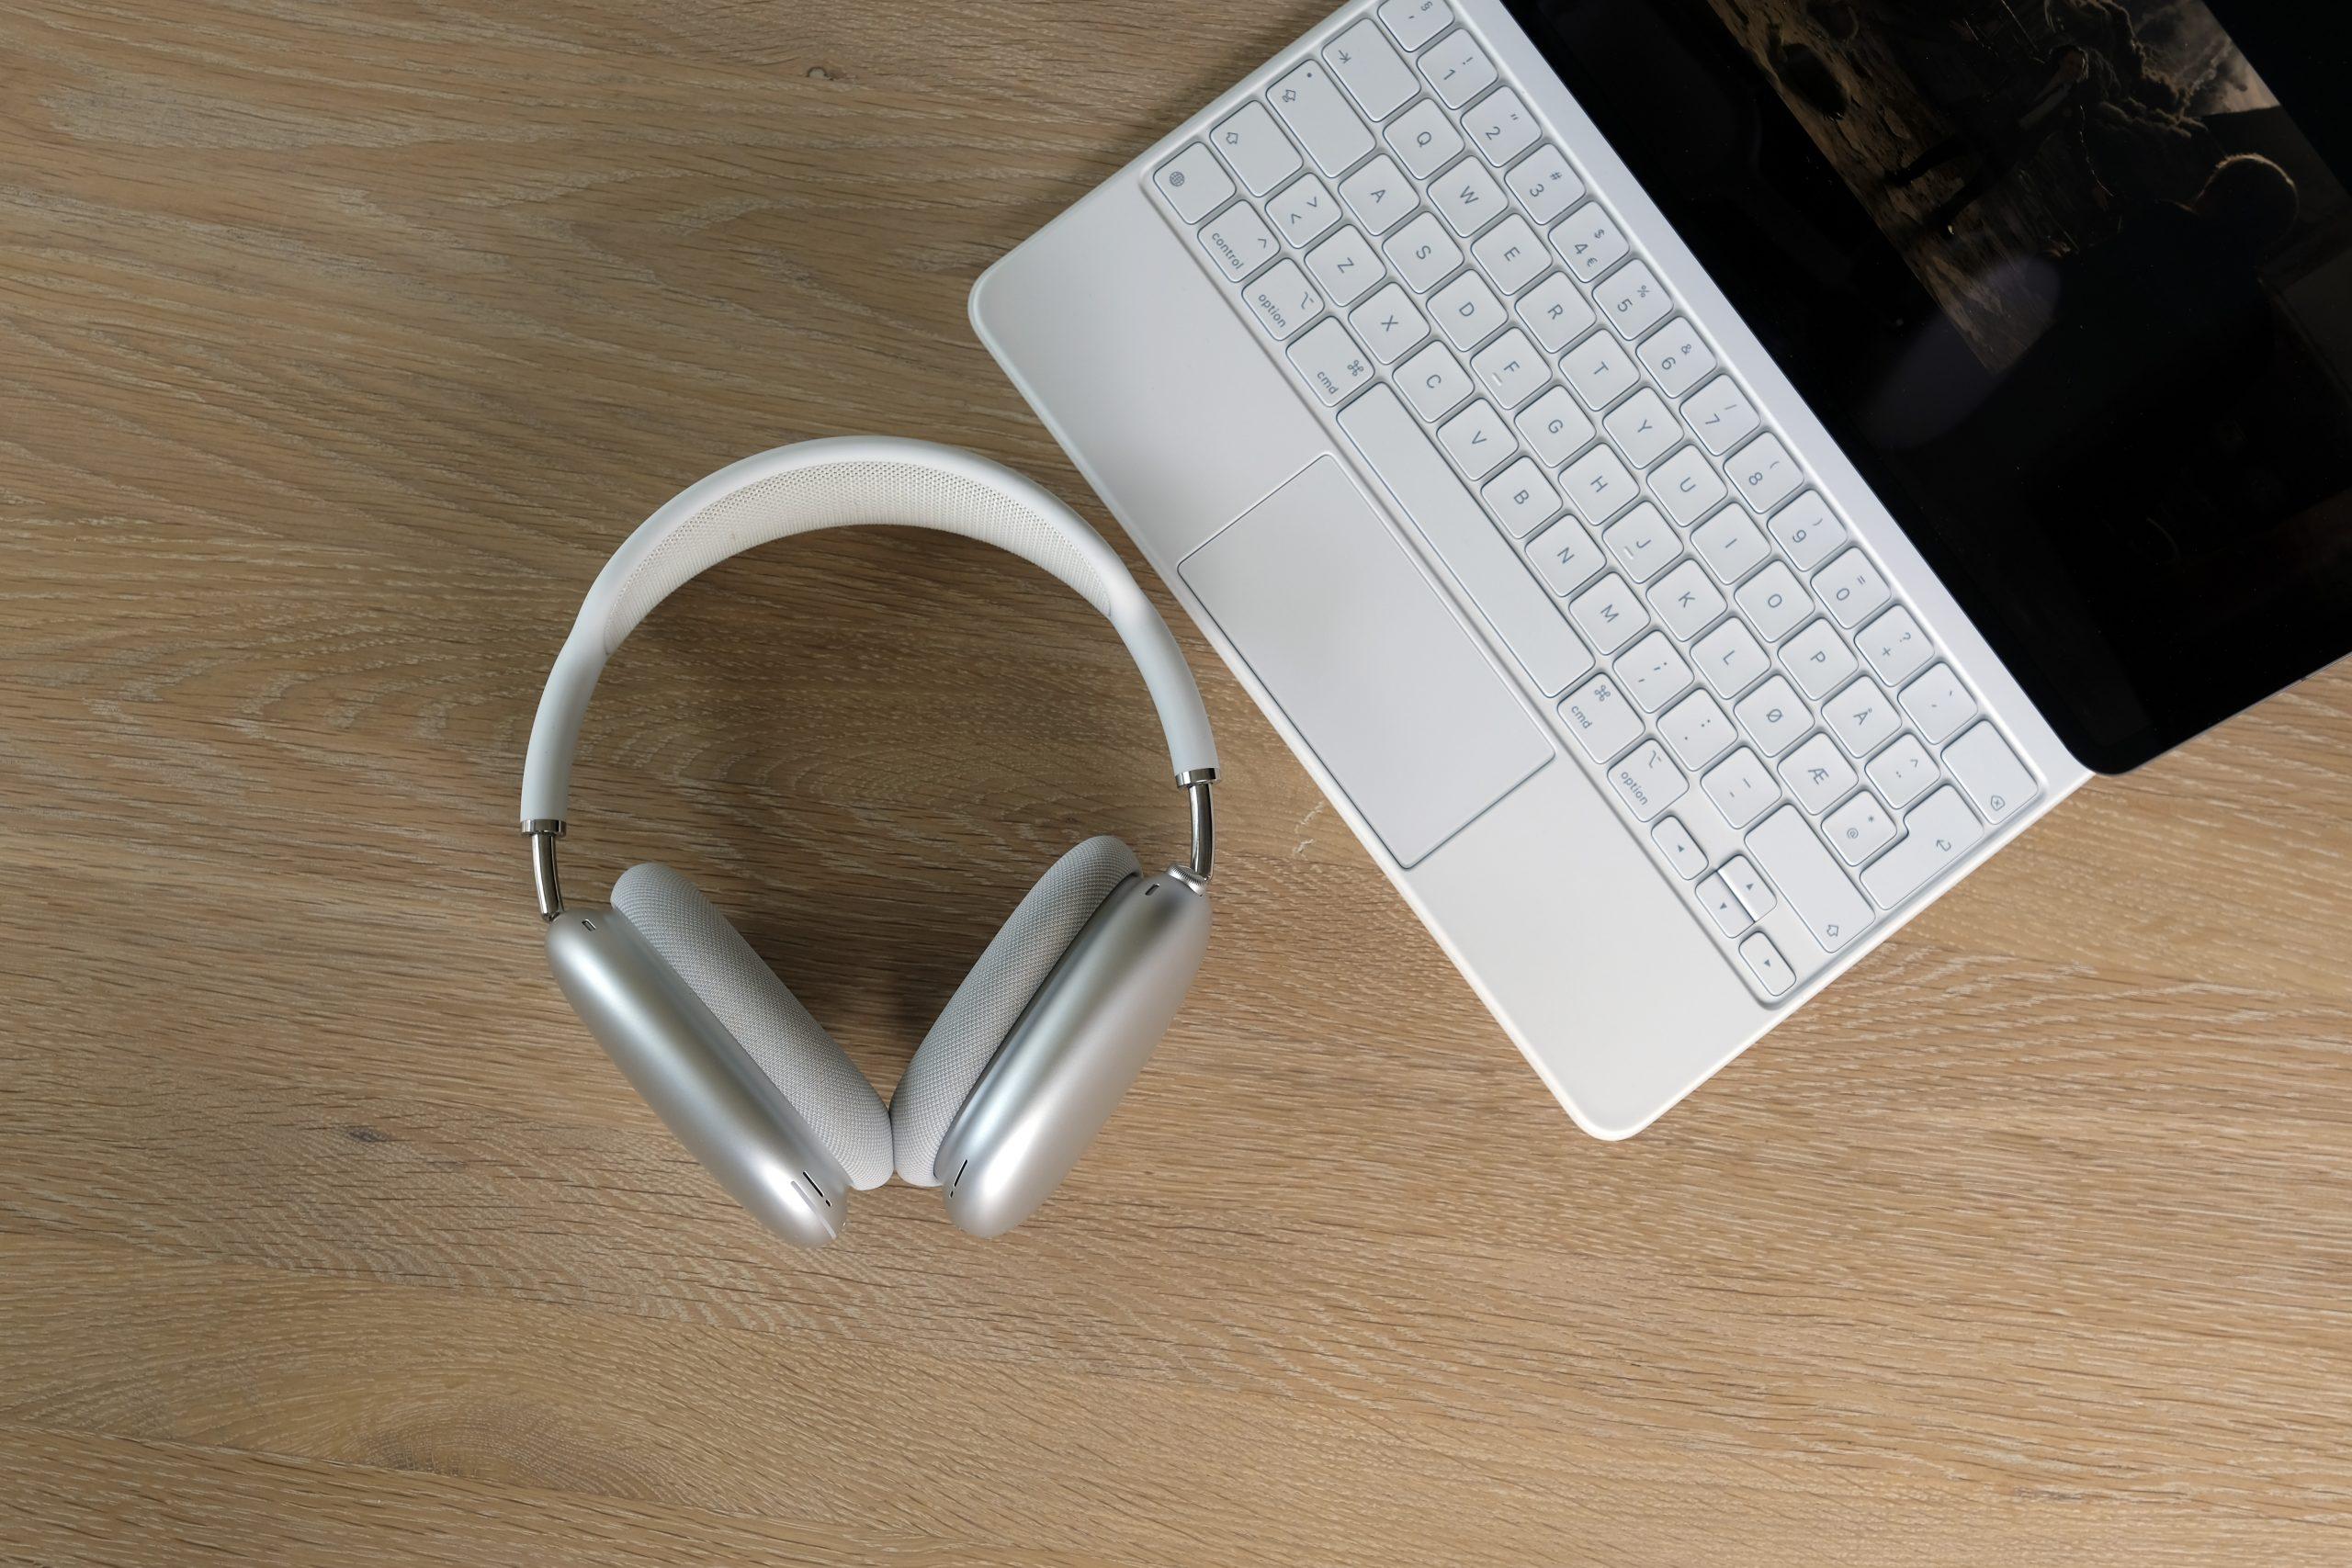 Apple Spatial Audio headphones